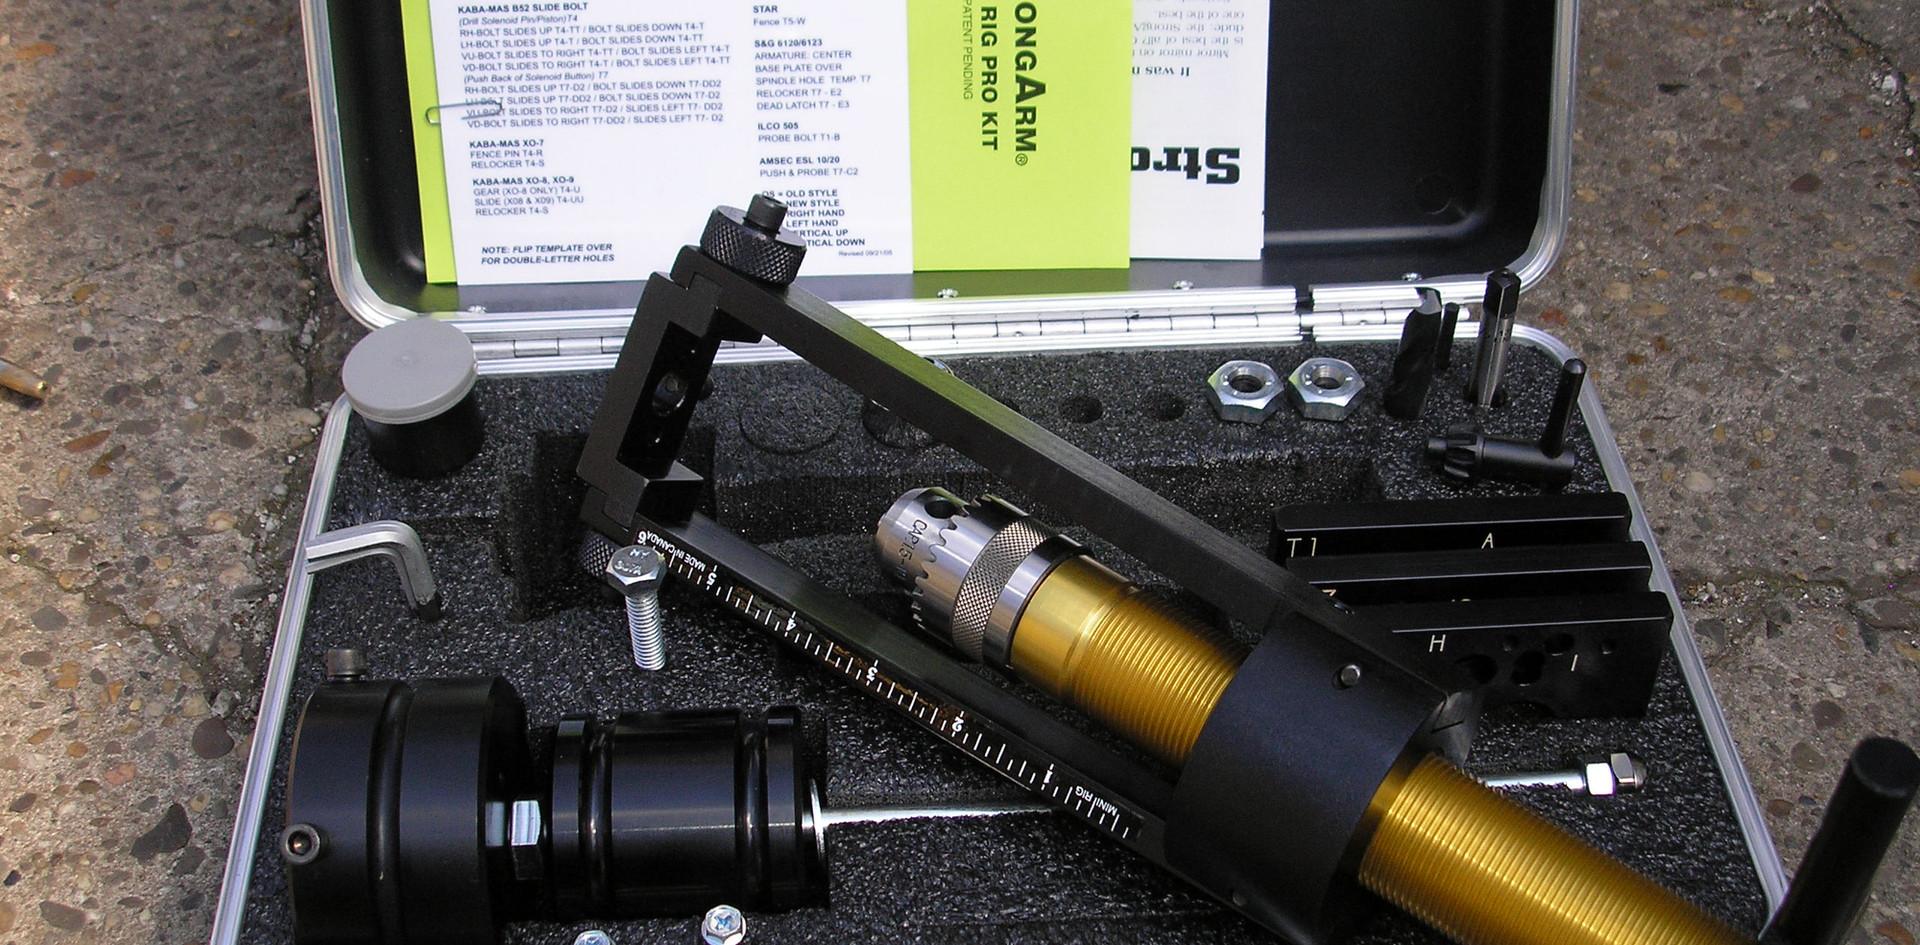 Kluisopening Brandkast Opening Reparatie